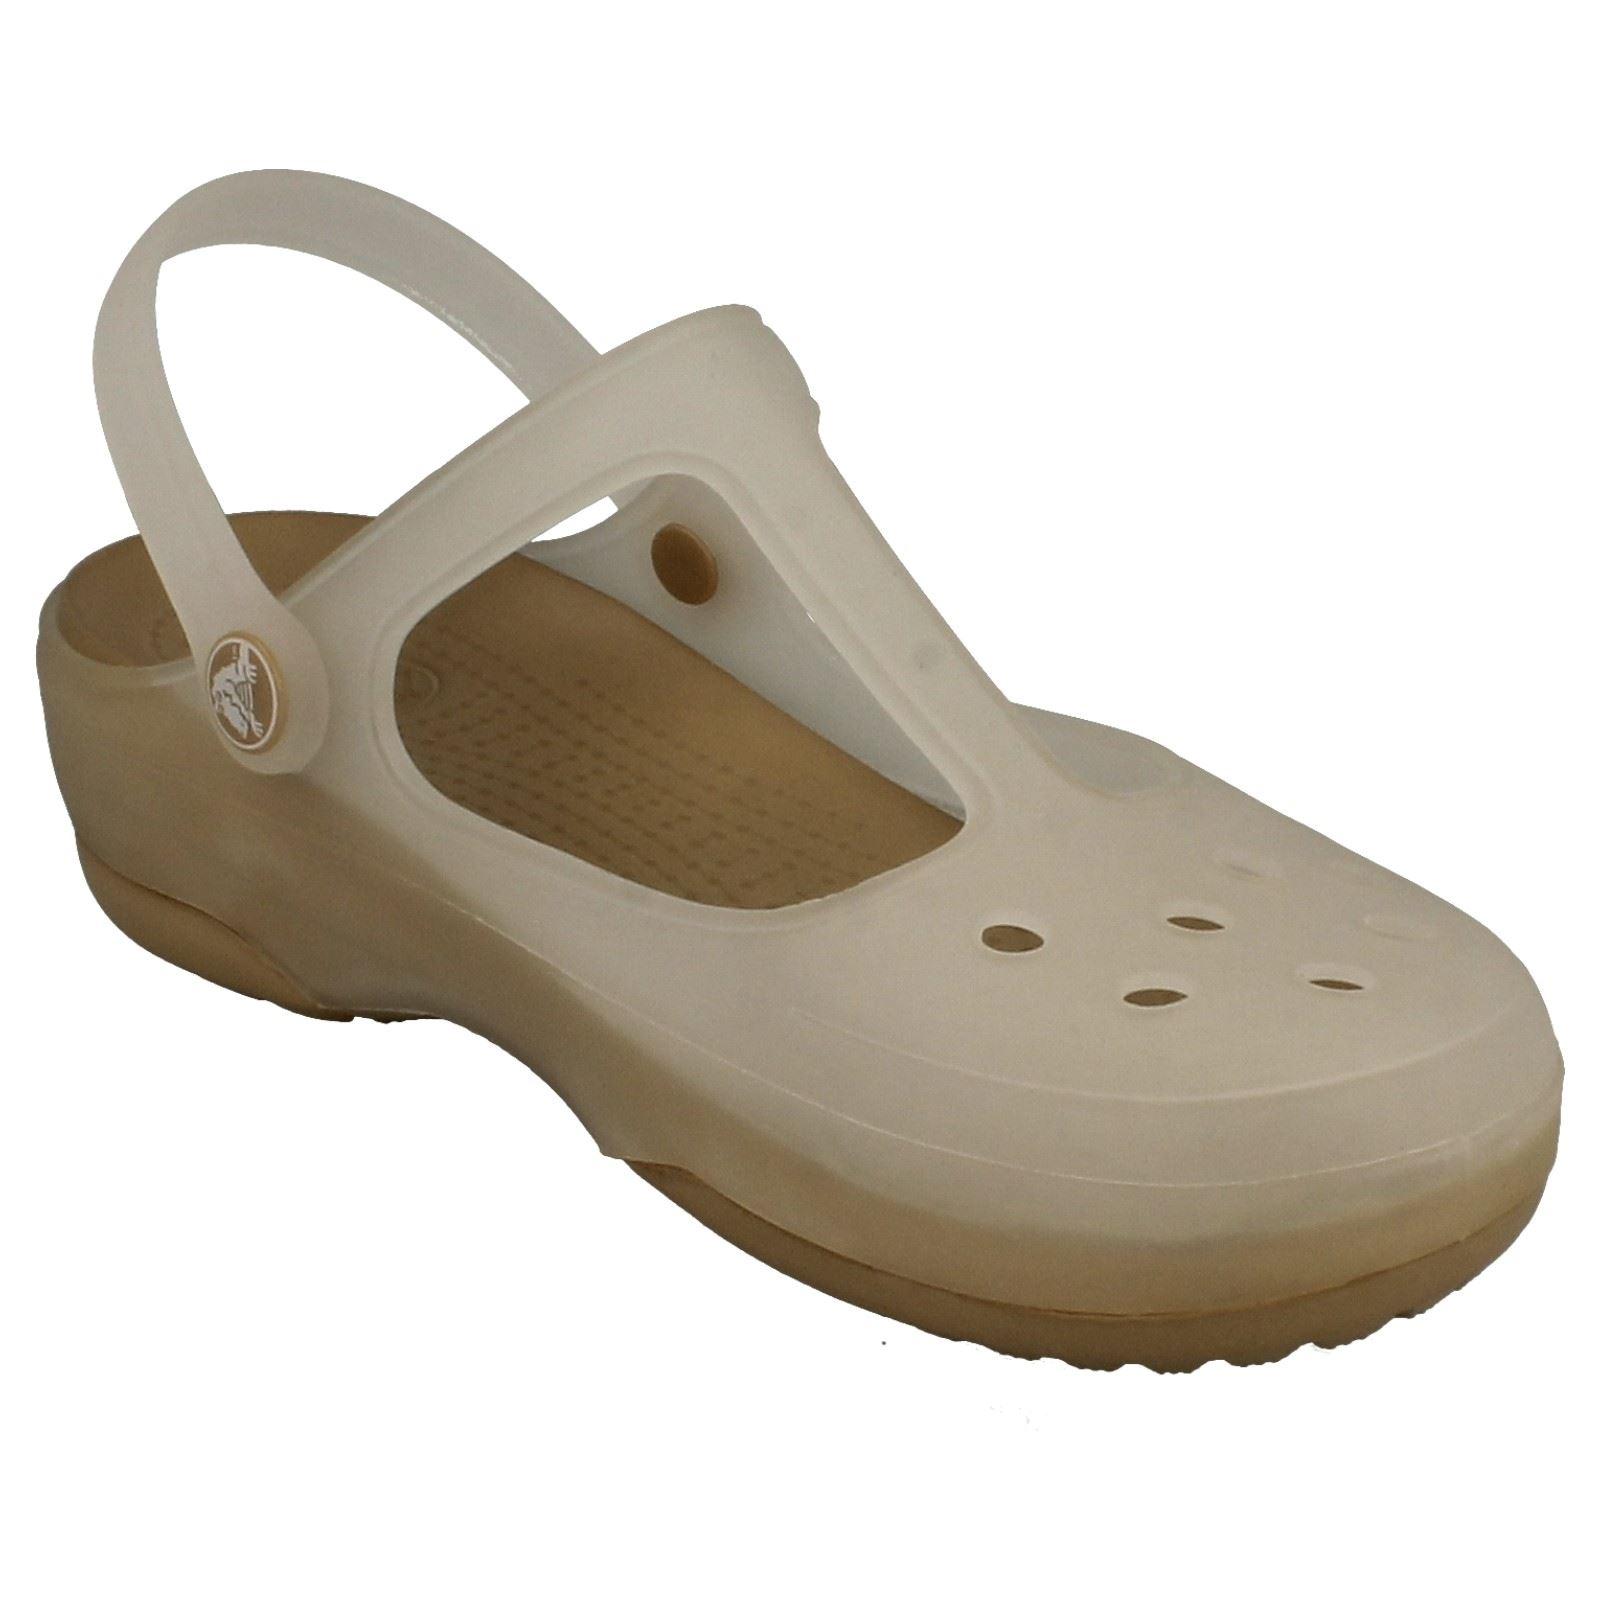 Ladies Crocs Slip On Sandals Carlie Mary Jane | eBay - photo#26